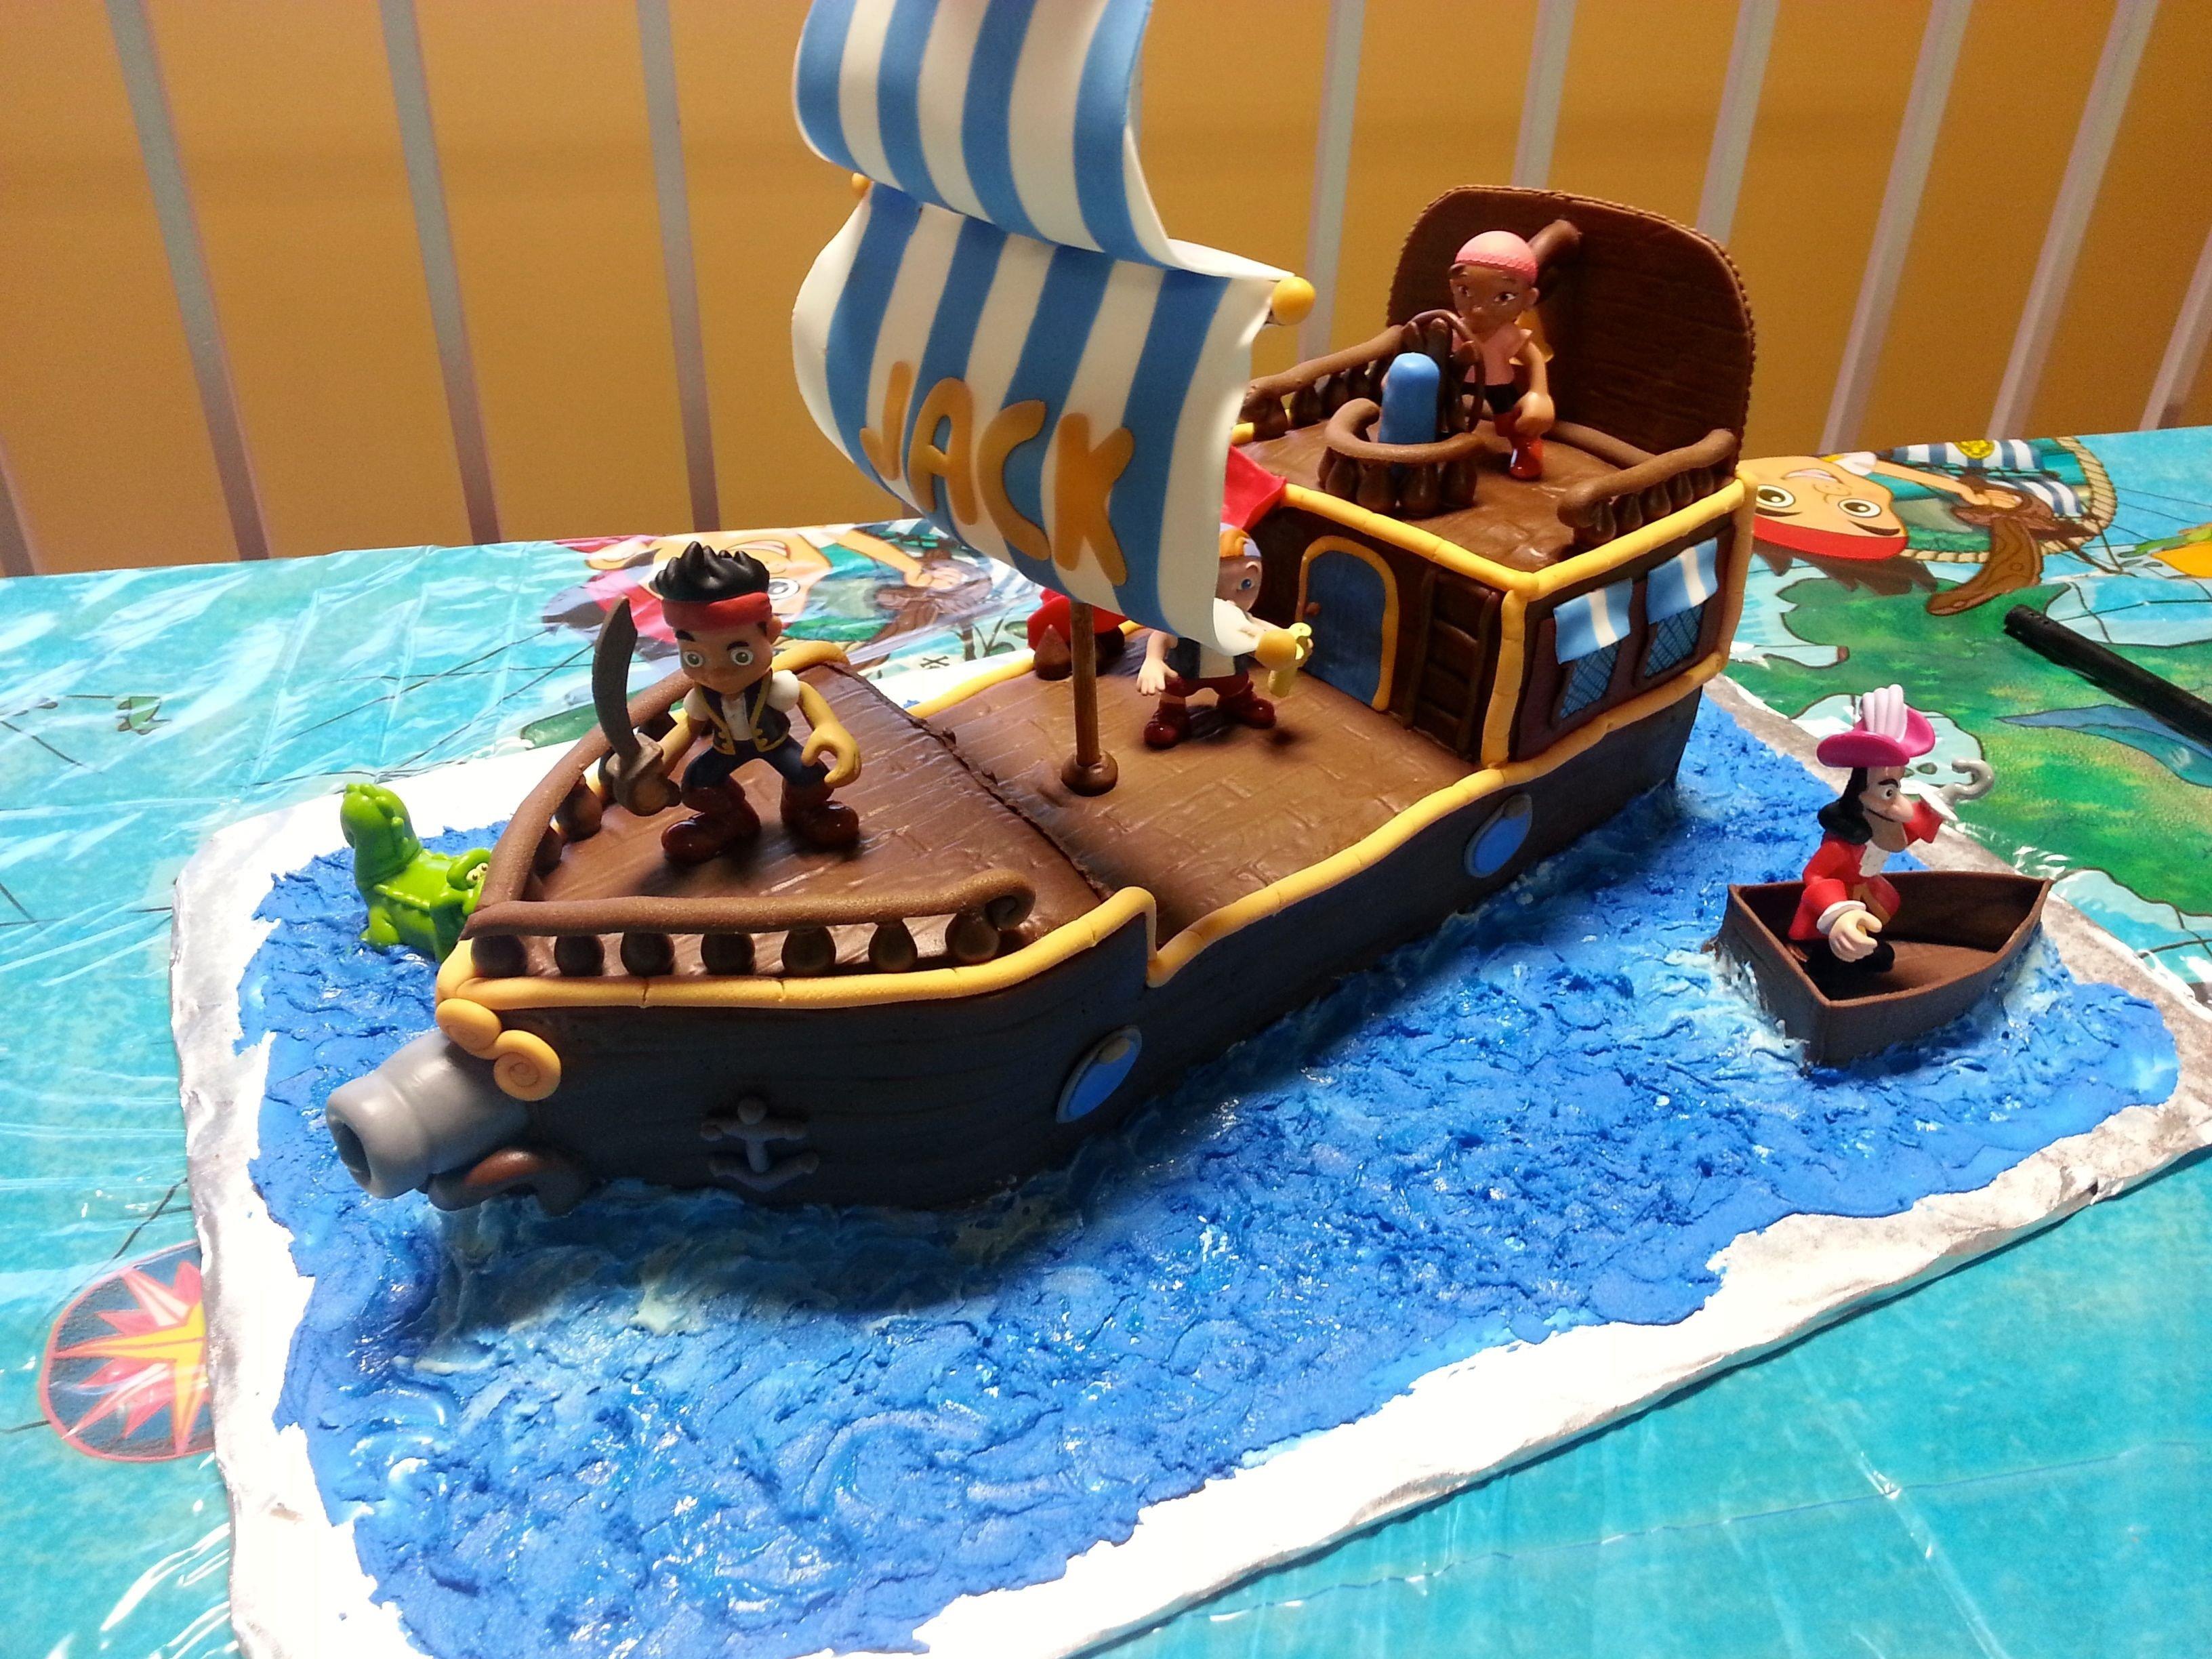 10 Nice Jake And The Neverland Pirate Cake Ideas jake and the neverland pirates cake jake and the neverland pirate 2 2020